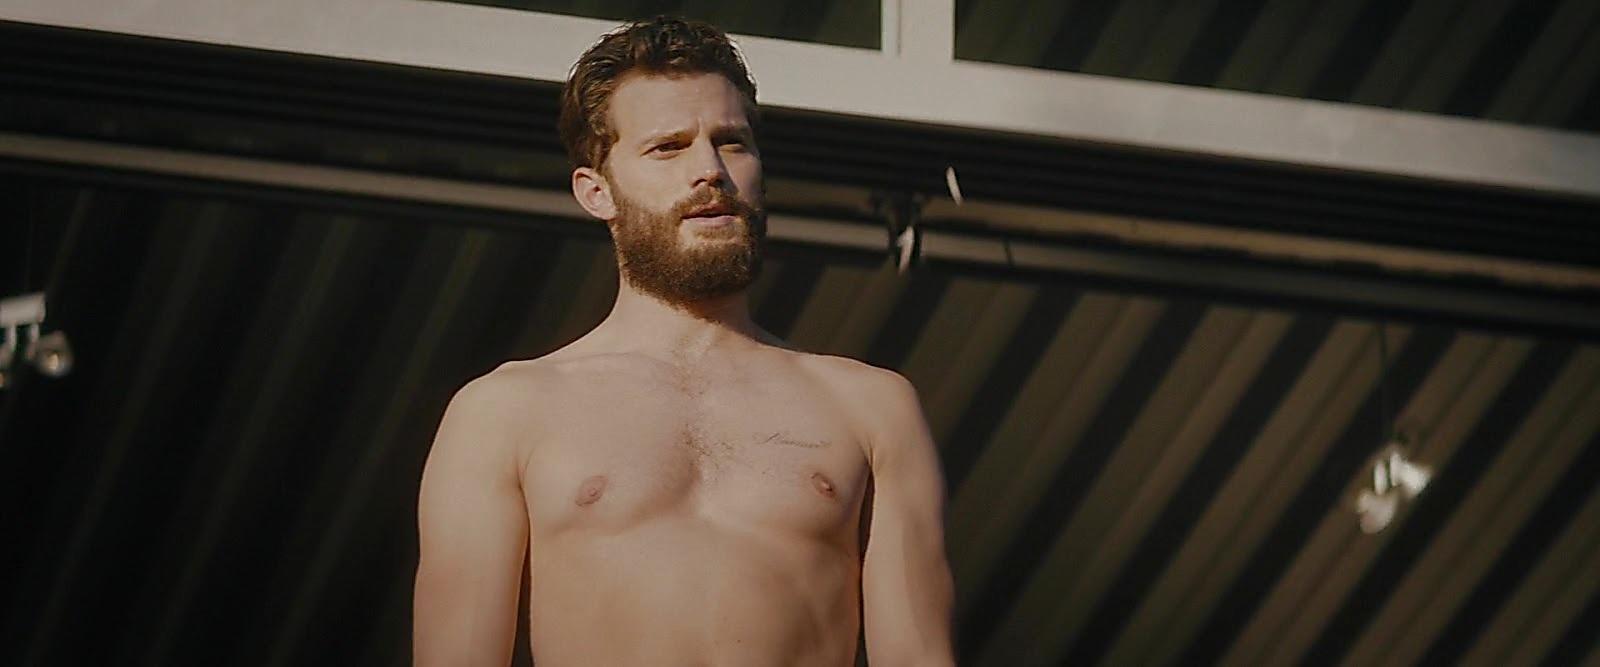 Jamie Dornan sexy shirtless scene February 8, 2019, 11am